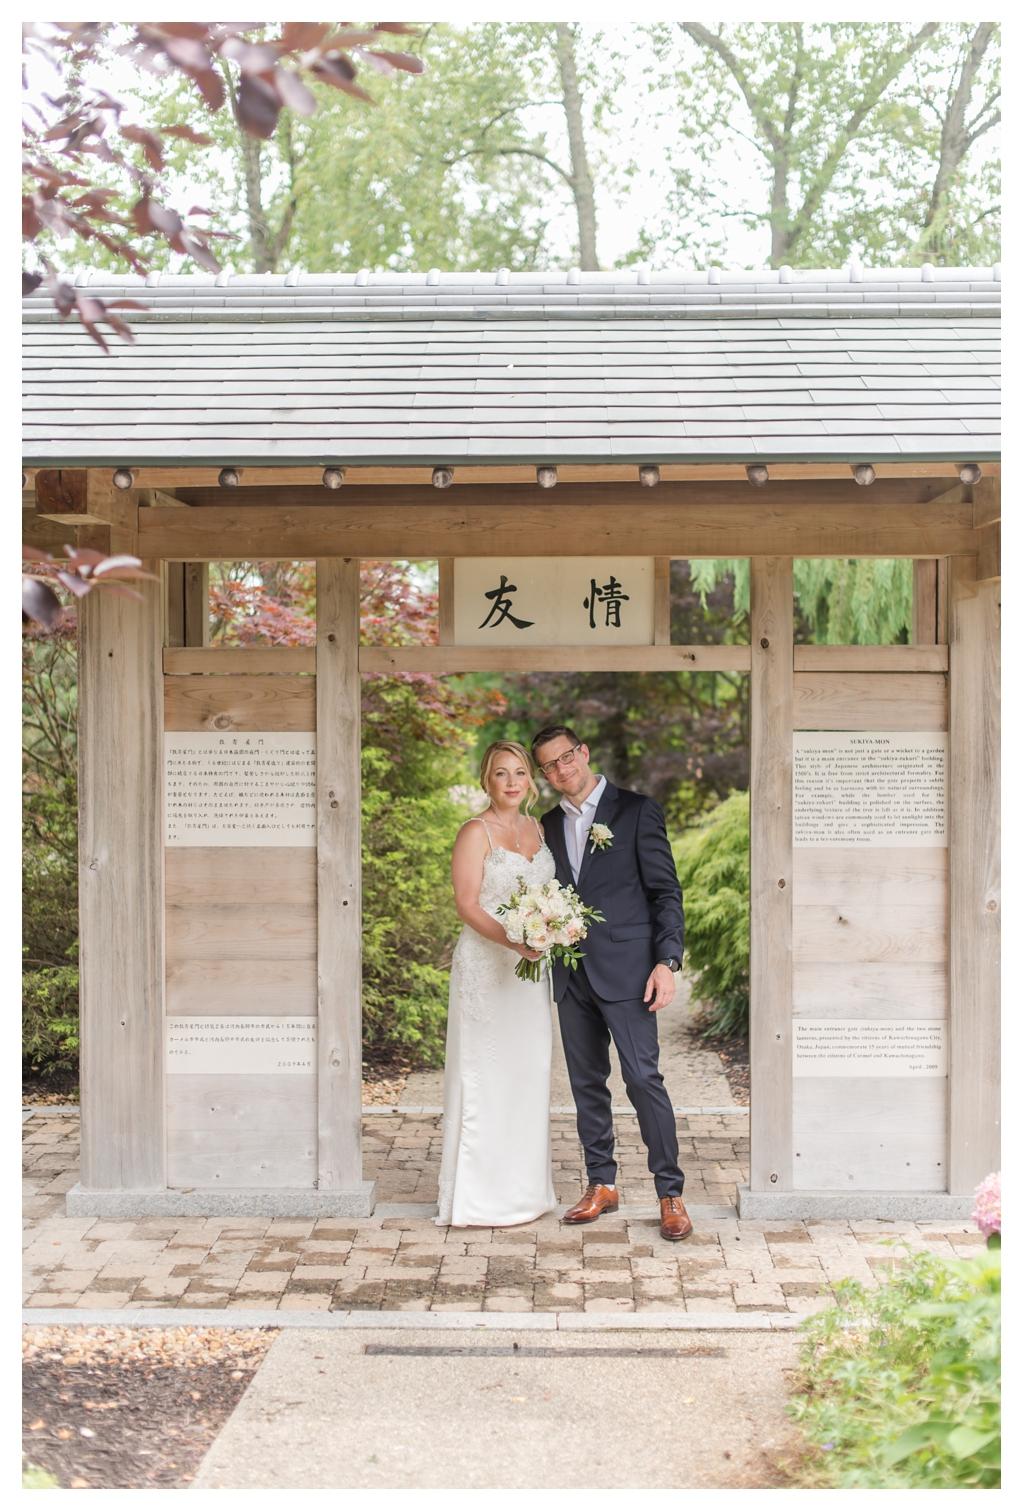 Carmel Japanese Gardens Wedding Photos_1504.jpg